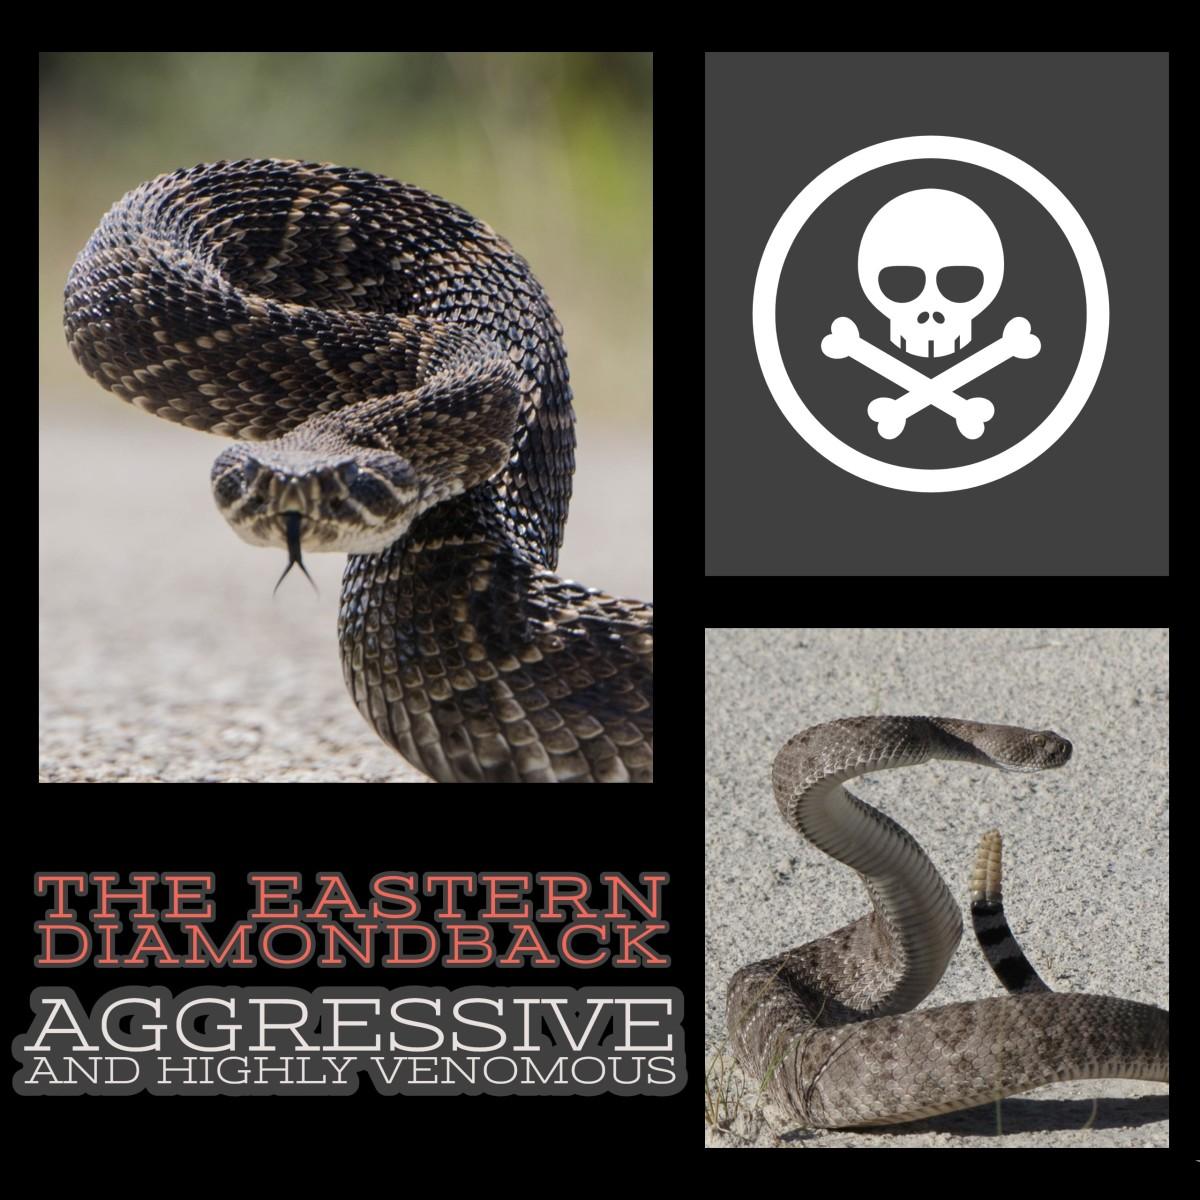 The Eastern Diamondback Rattlesnake: Aggressive and Highly Venomous.